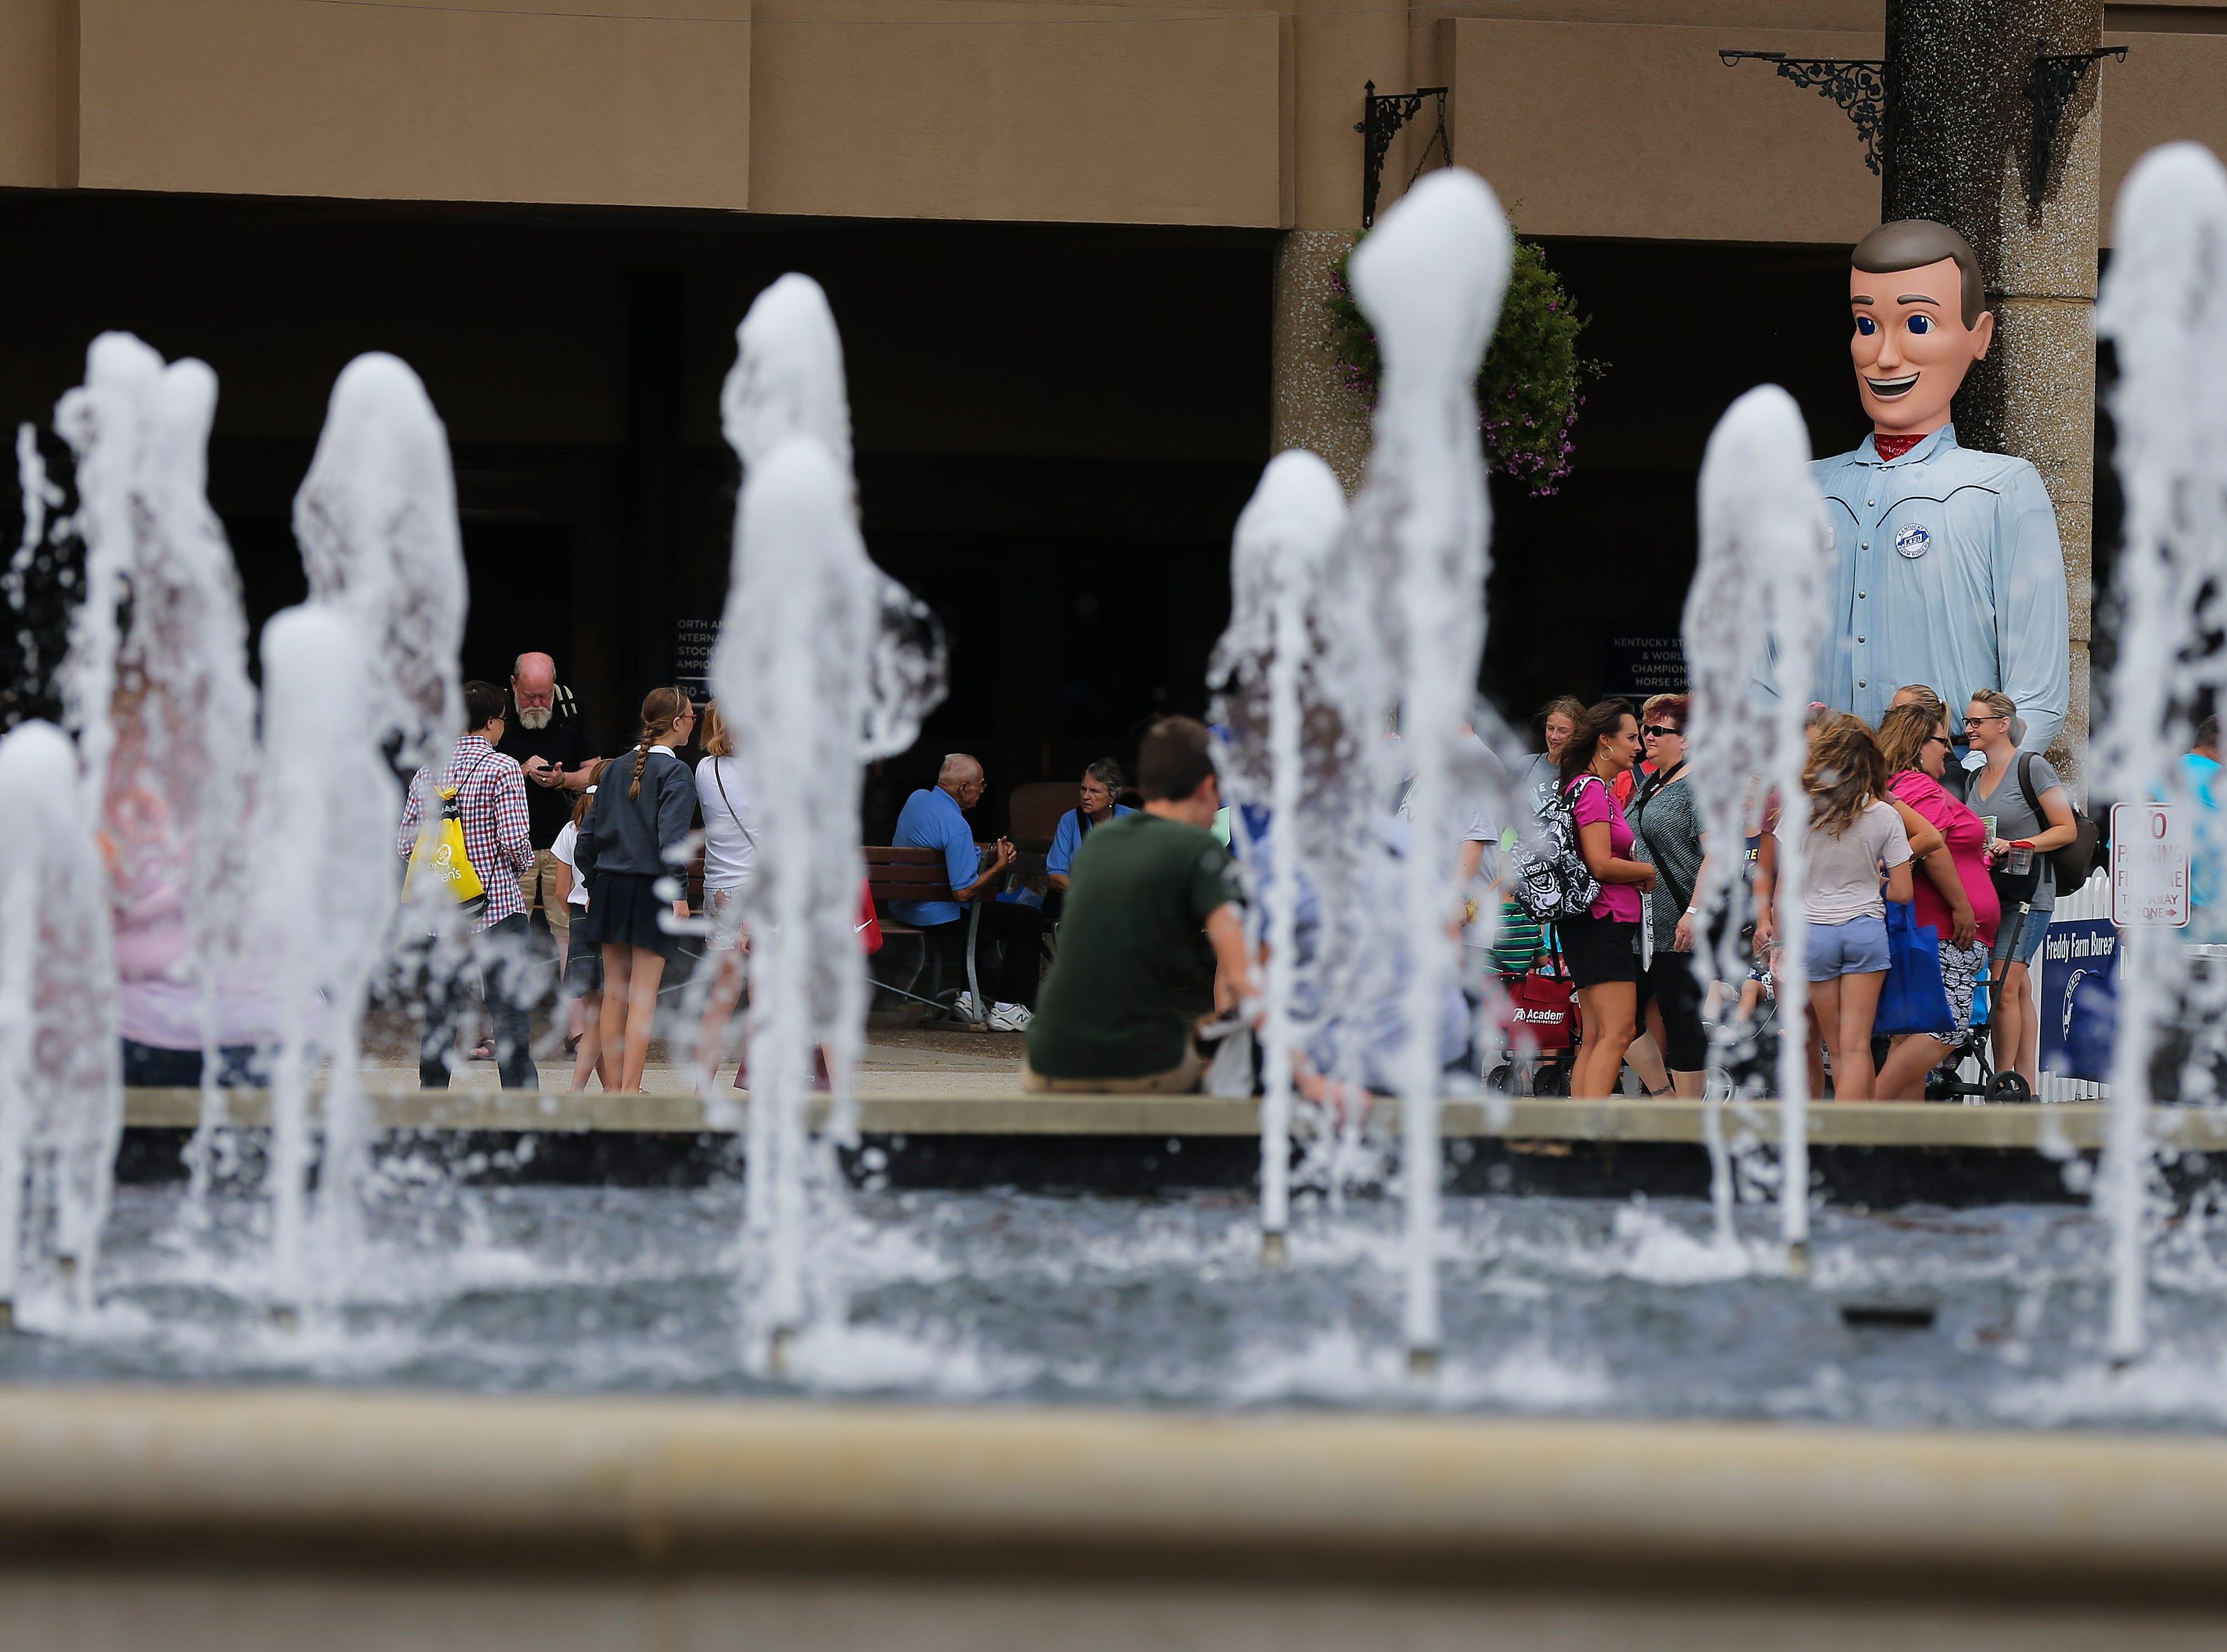 Freddie Farm Bureau peeks through water spray during the first day of the Kentucky State Fair.Aug. 16, 2018